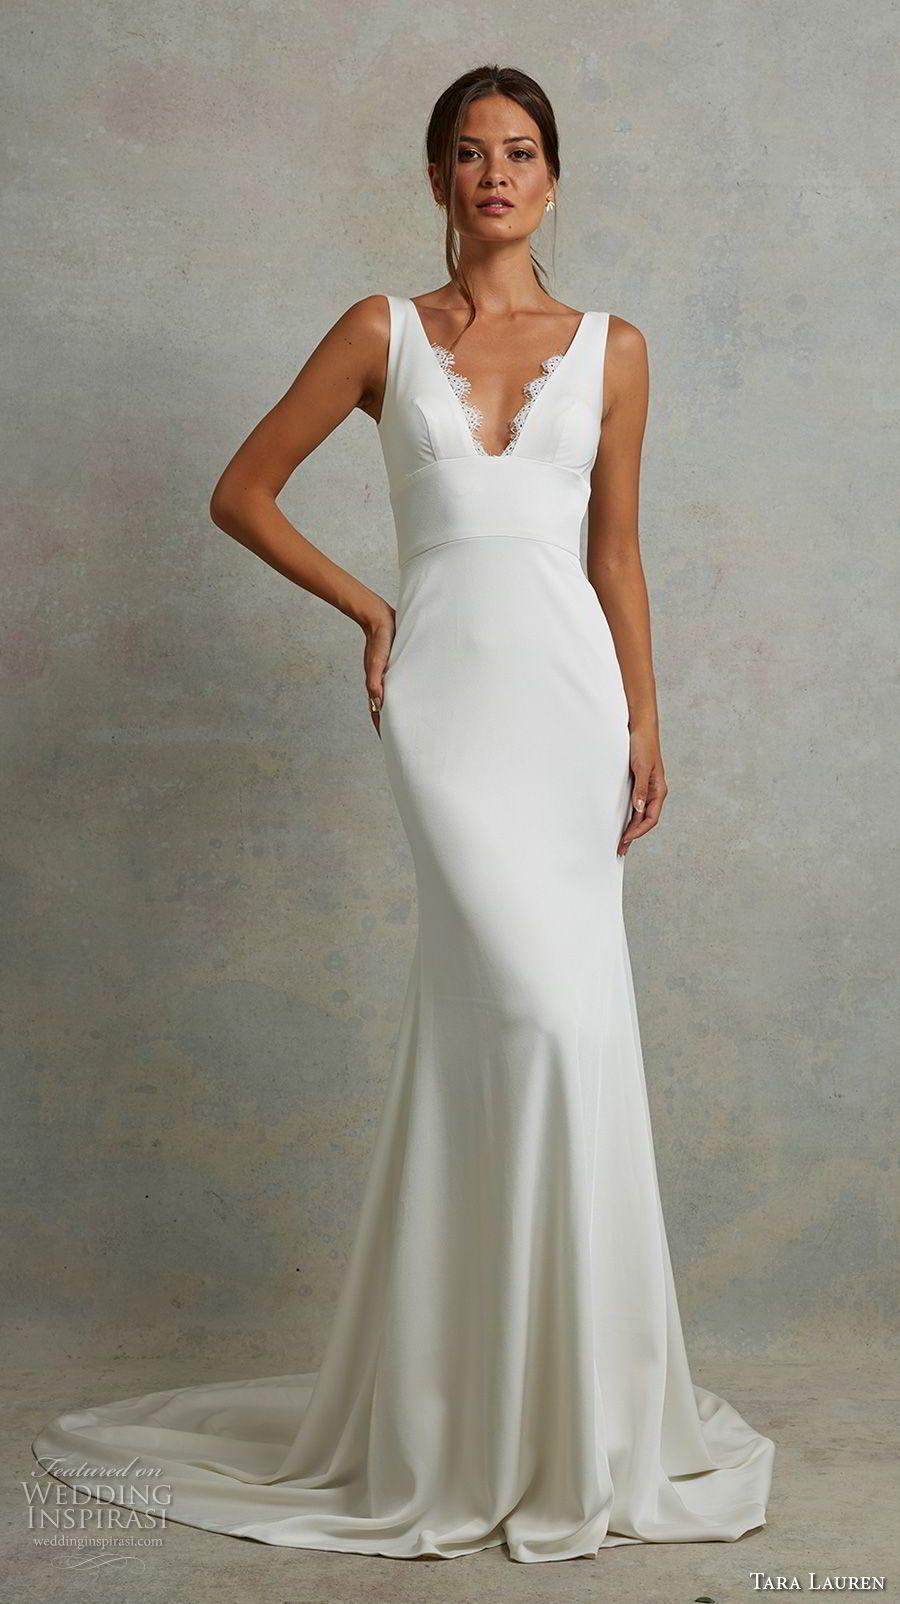 Tara lauren spring wedding dresses wedding dress elegant and